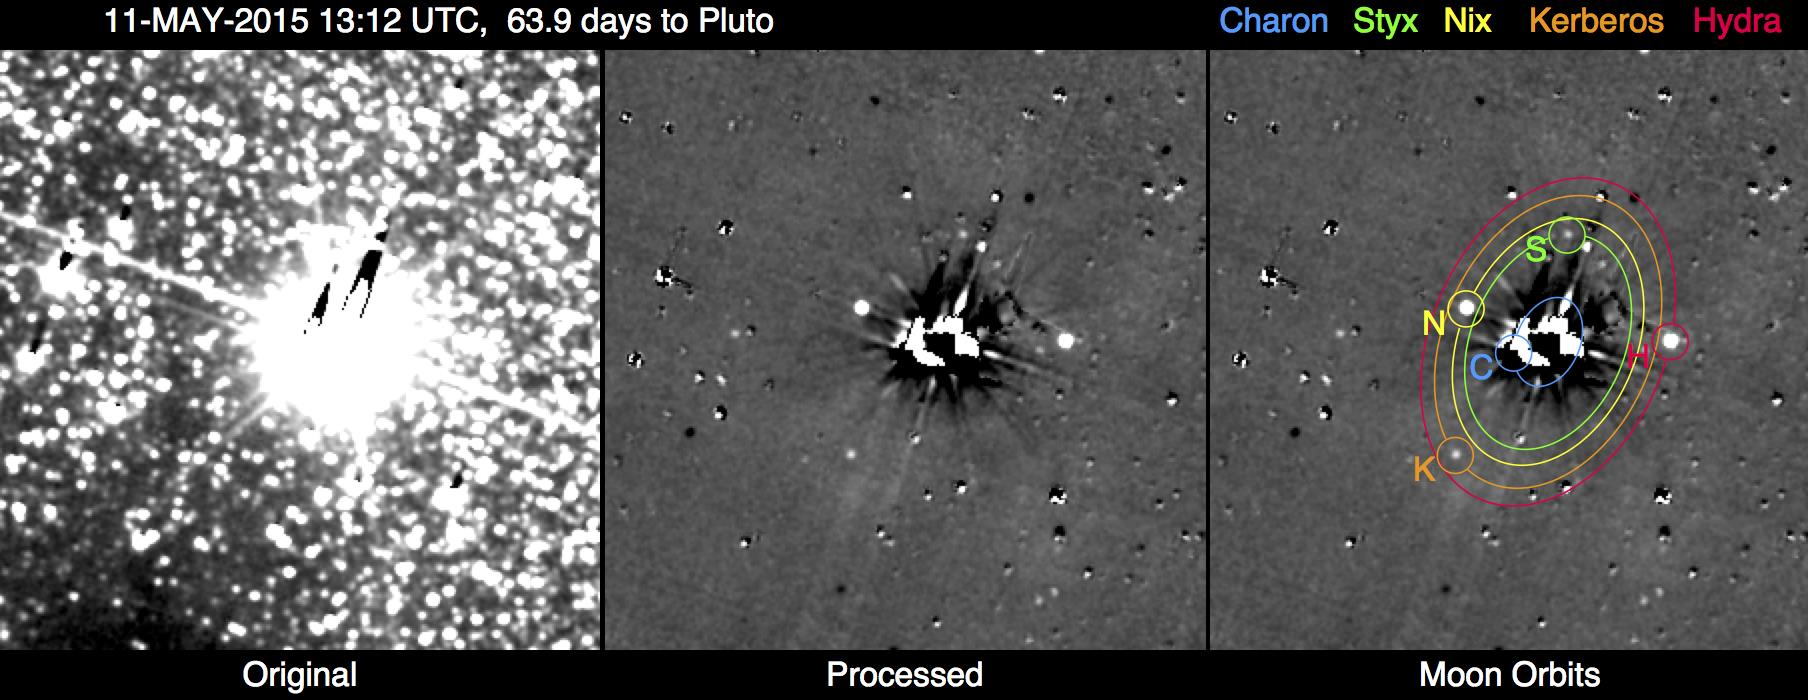 New Horizons : objectif Pluton EsPJmI5U